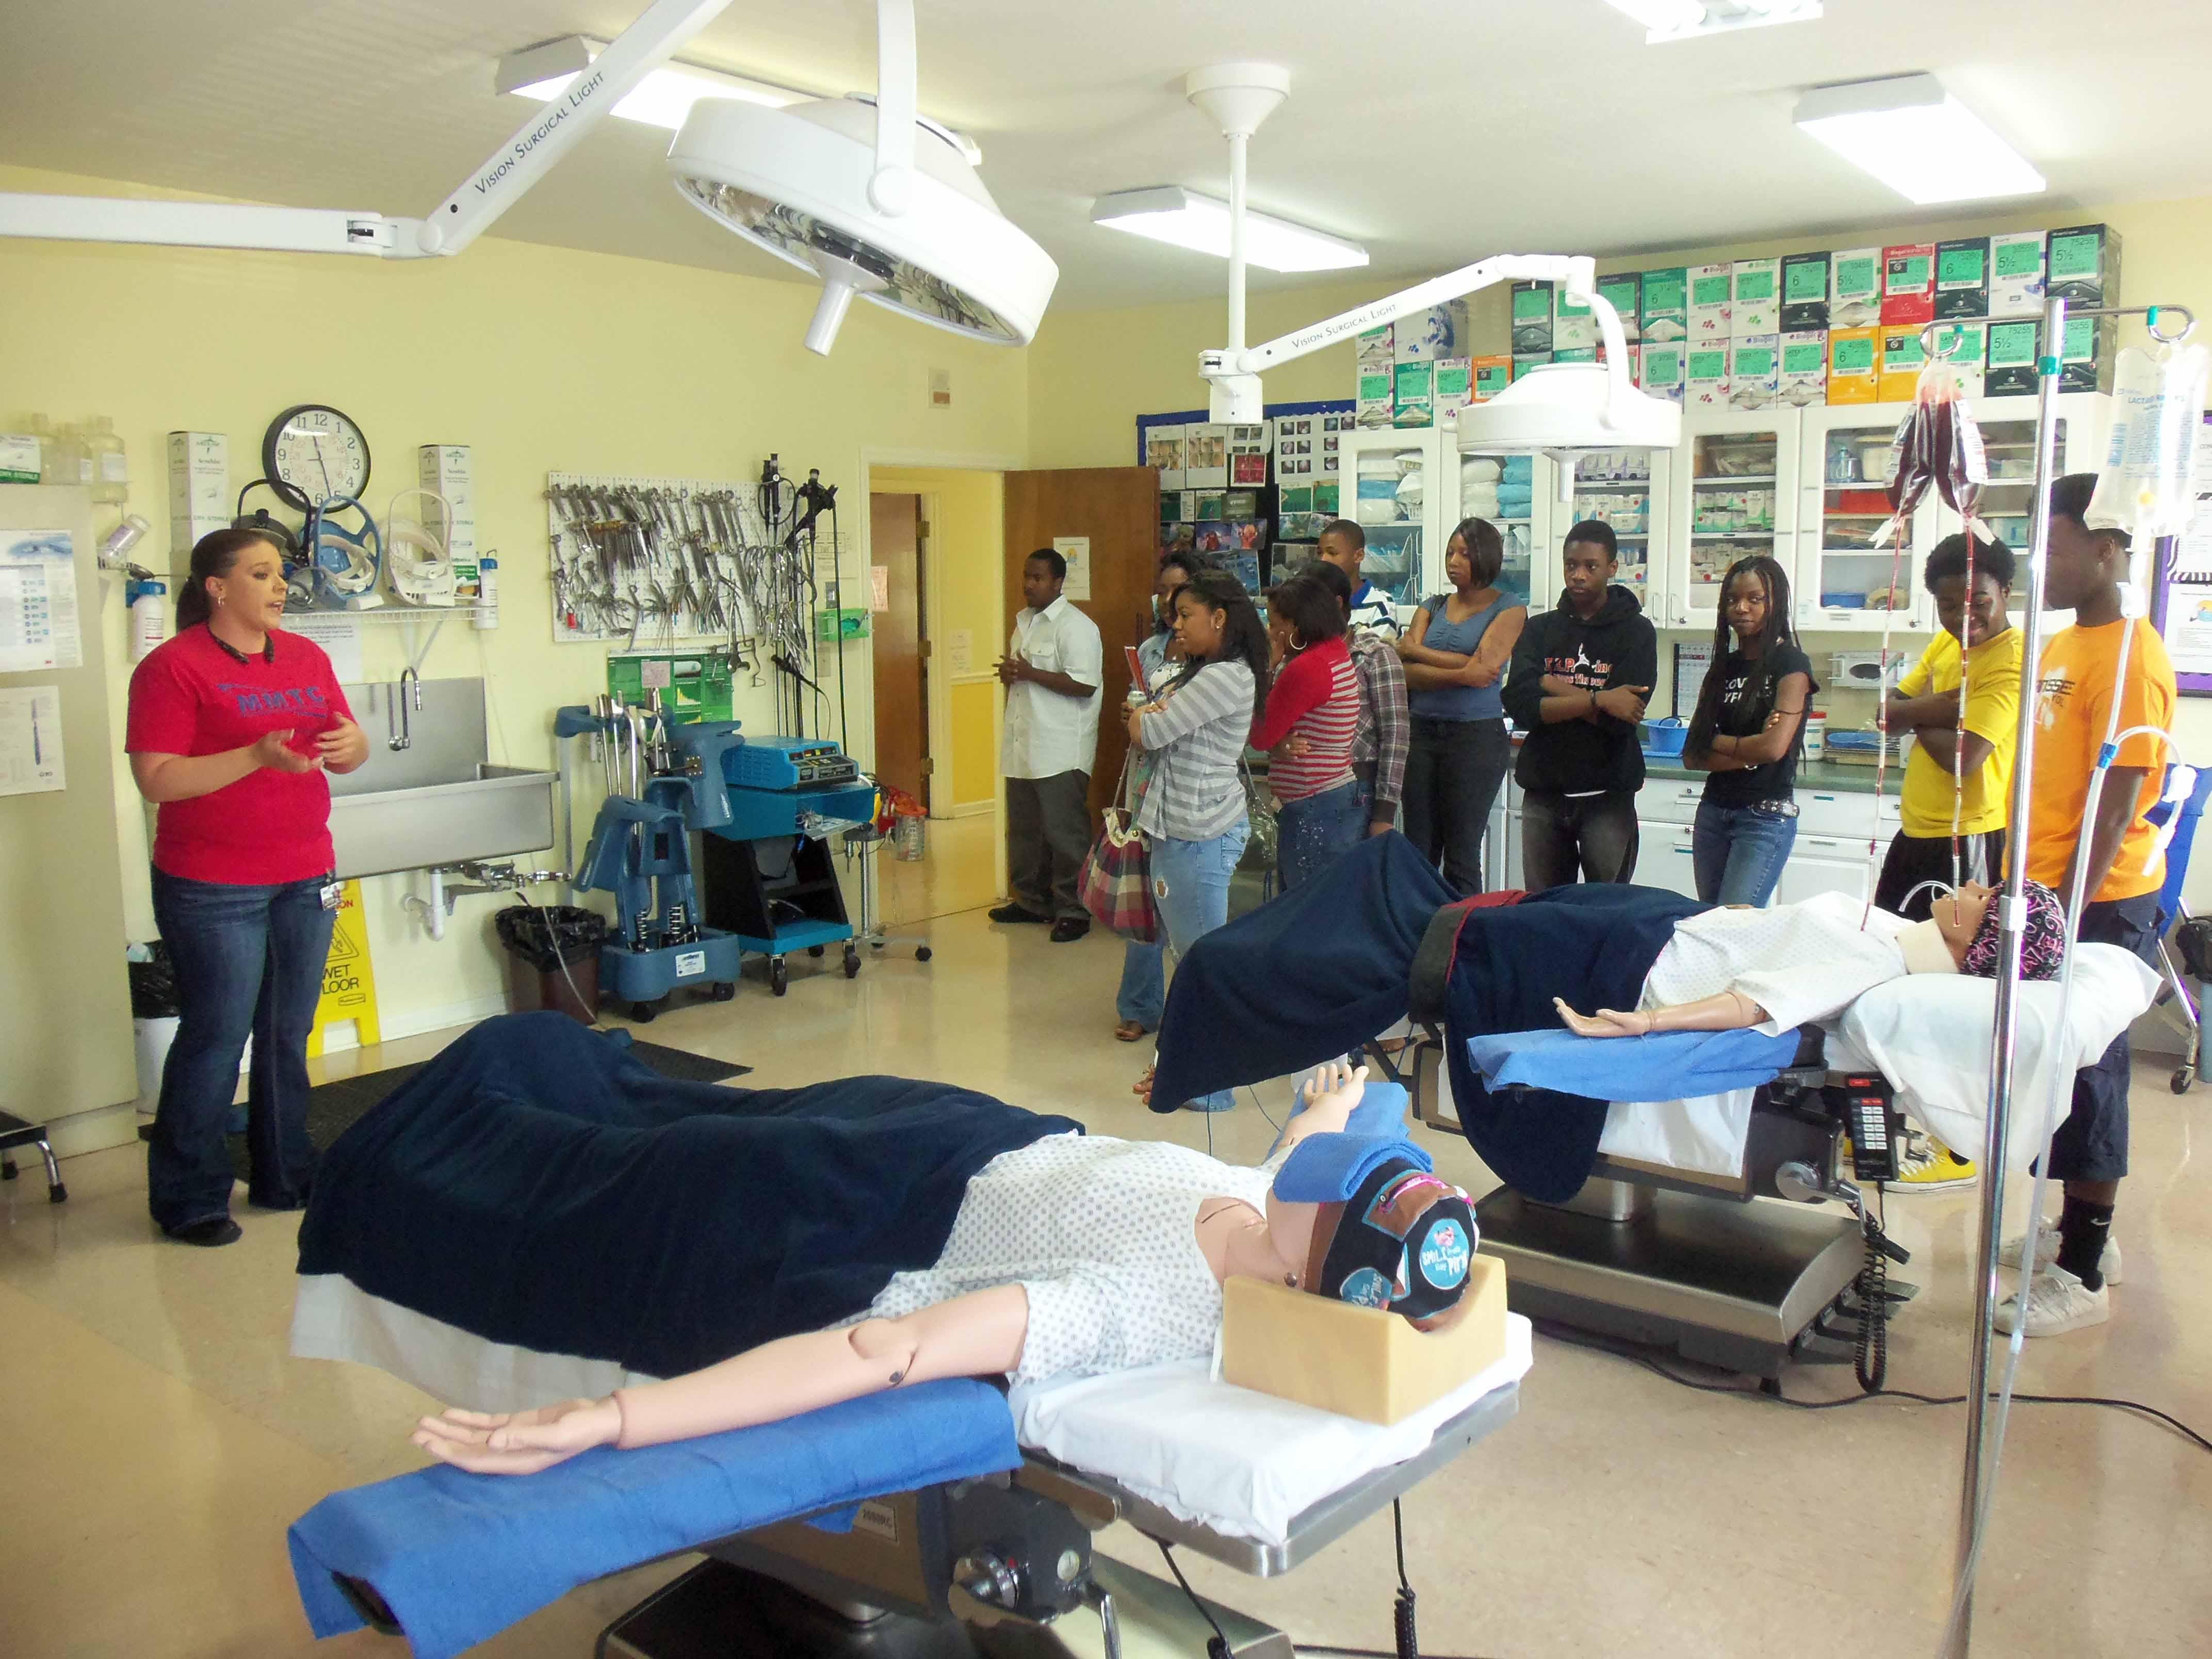 Massage School Austin Student Massage - Massage School